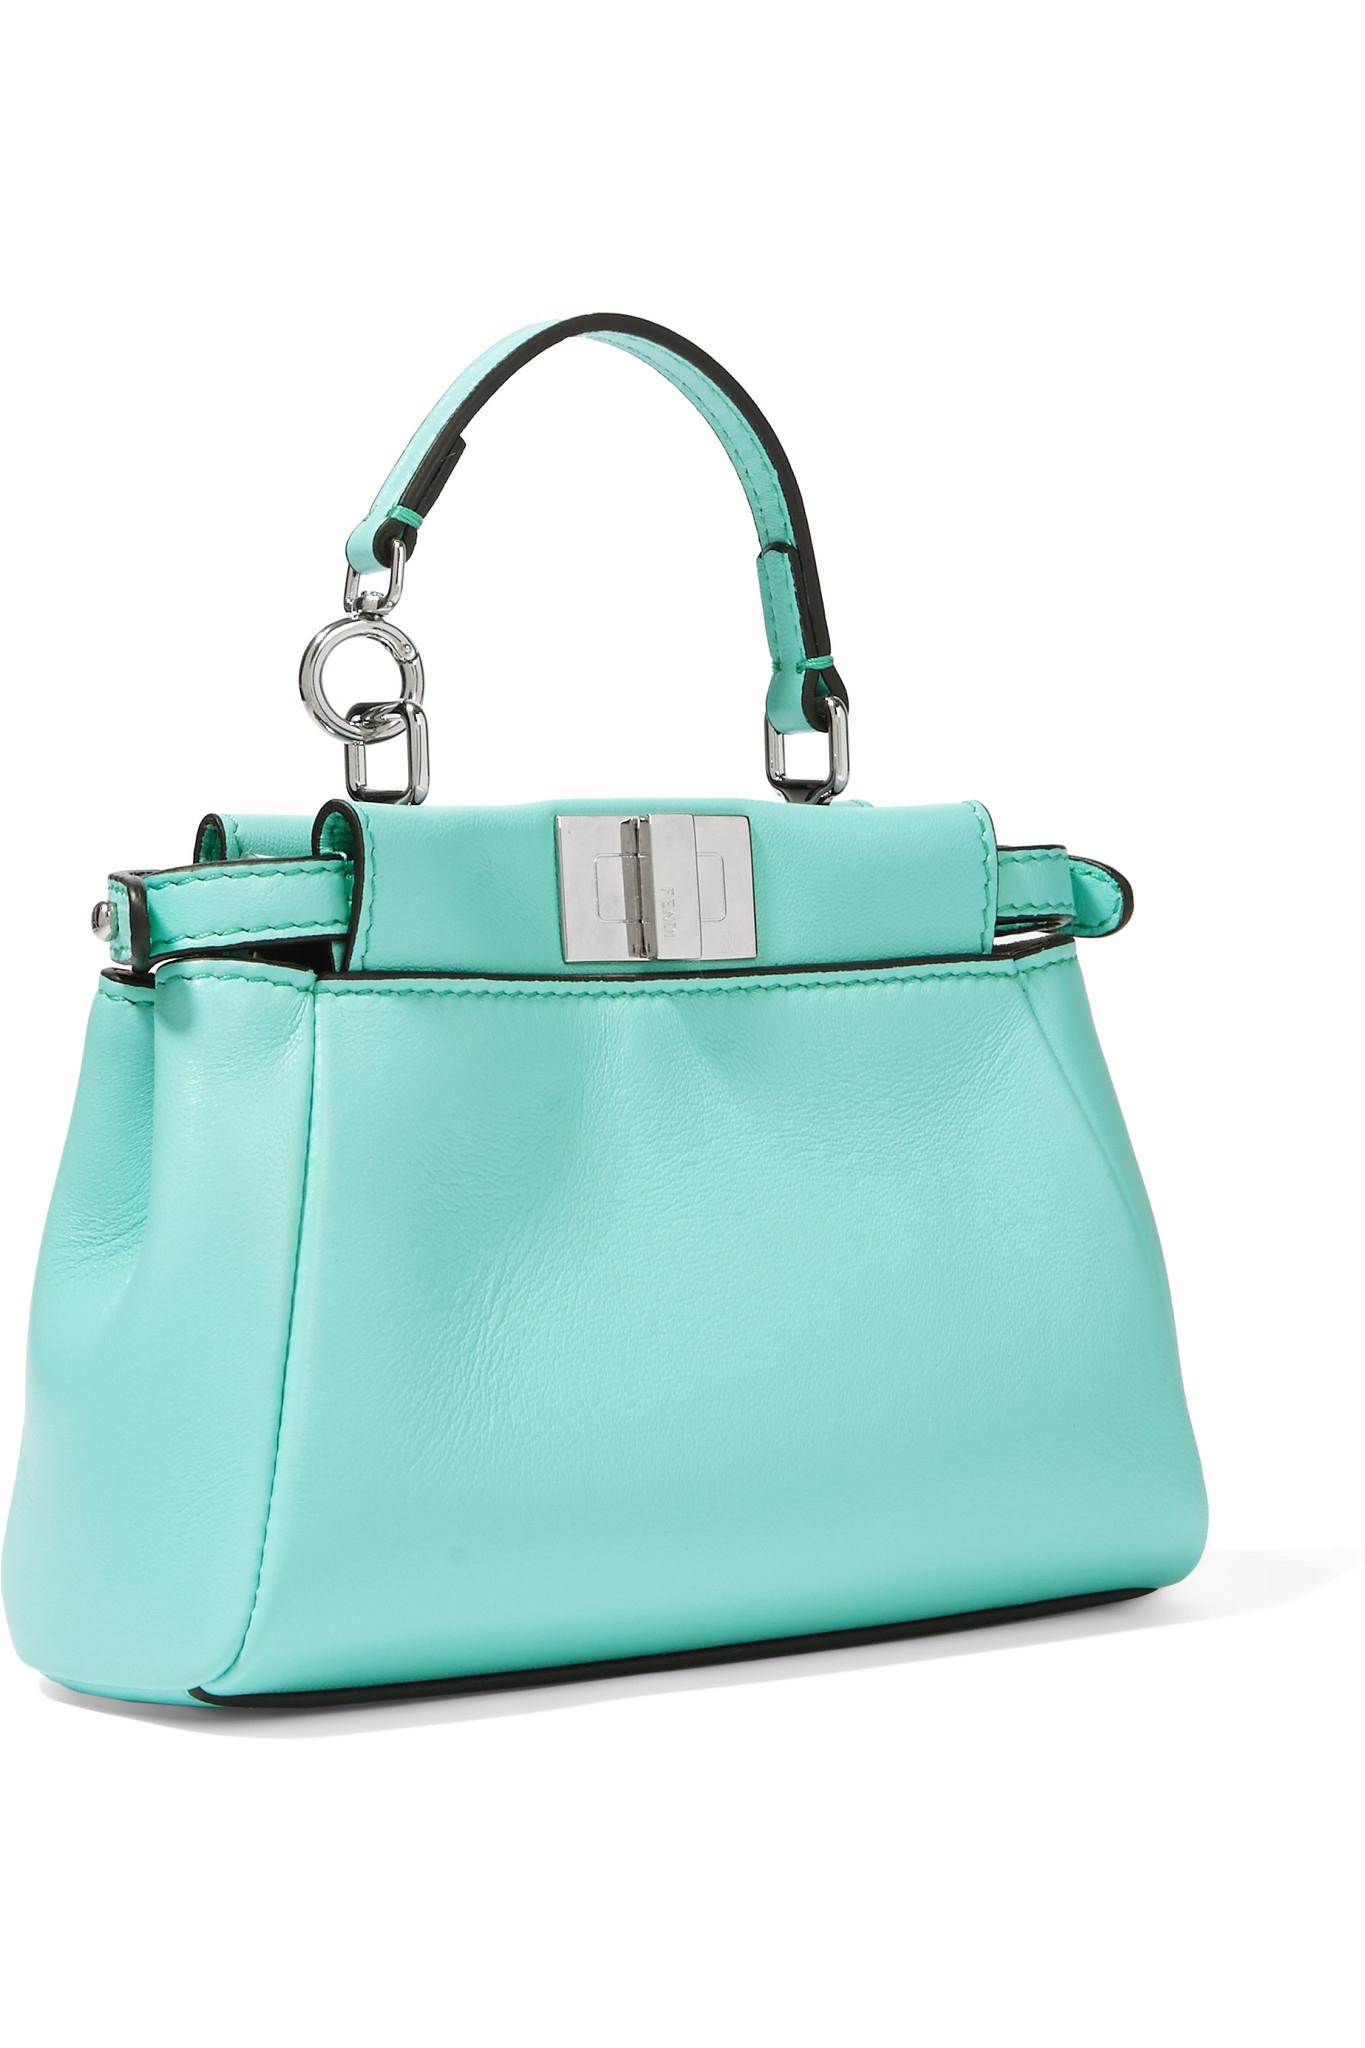 7e8c3292323a where to buy fendi peekaboo micro leather shoulder bag a8643 93c1f